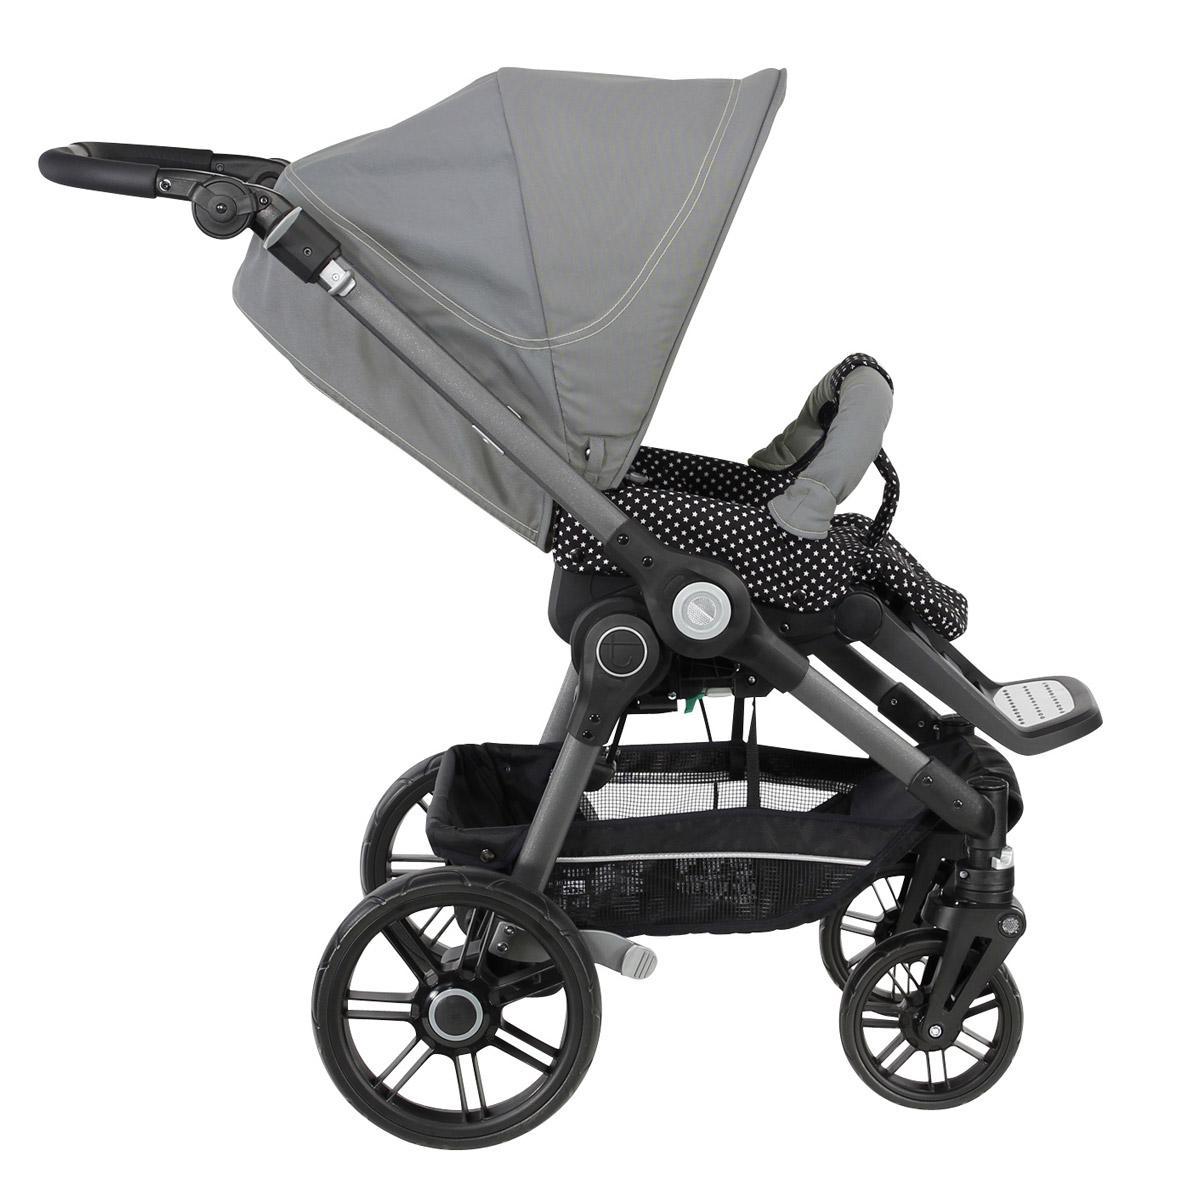 teutonia beyou v3 graphite rad 7 kinderwagen sportwagen 2015 farbwahl ebay. Black Bedroom Furniture Sets. Home Design Ideas